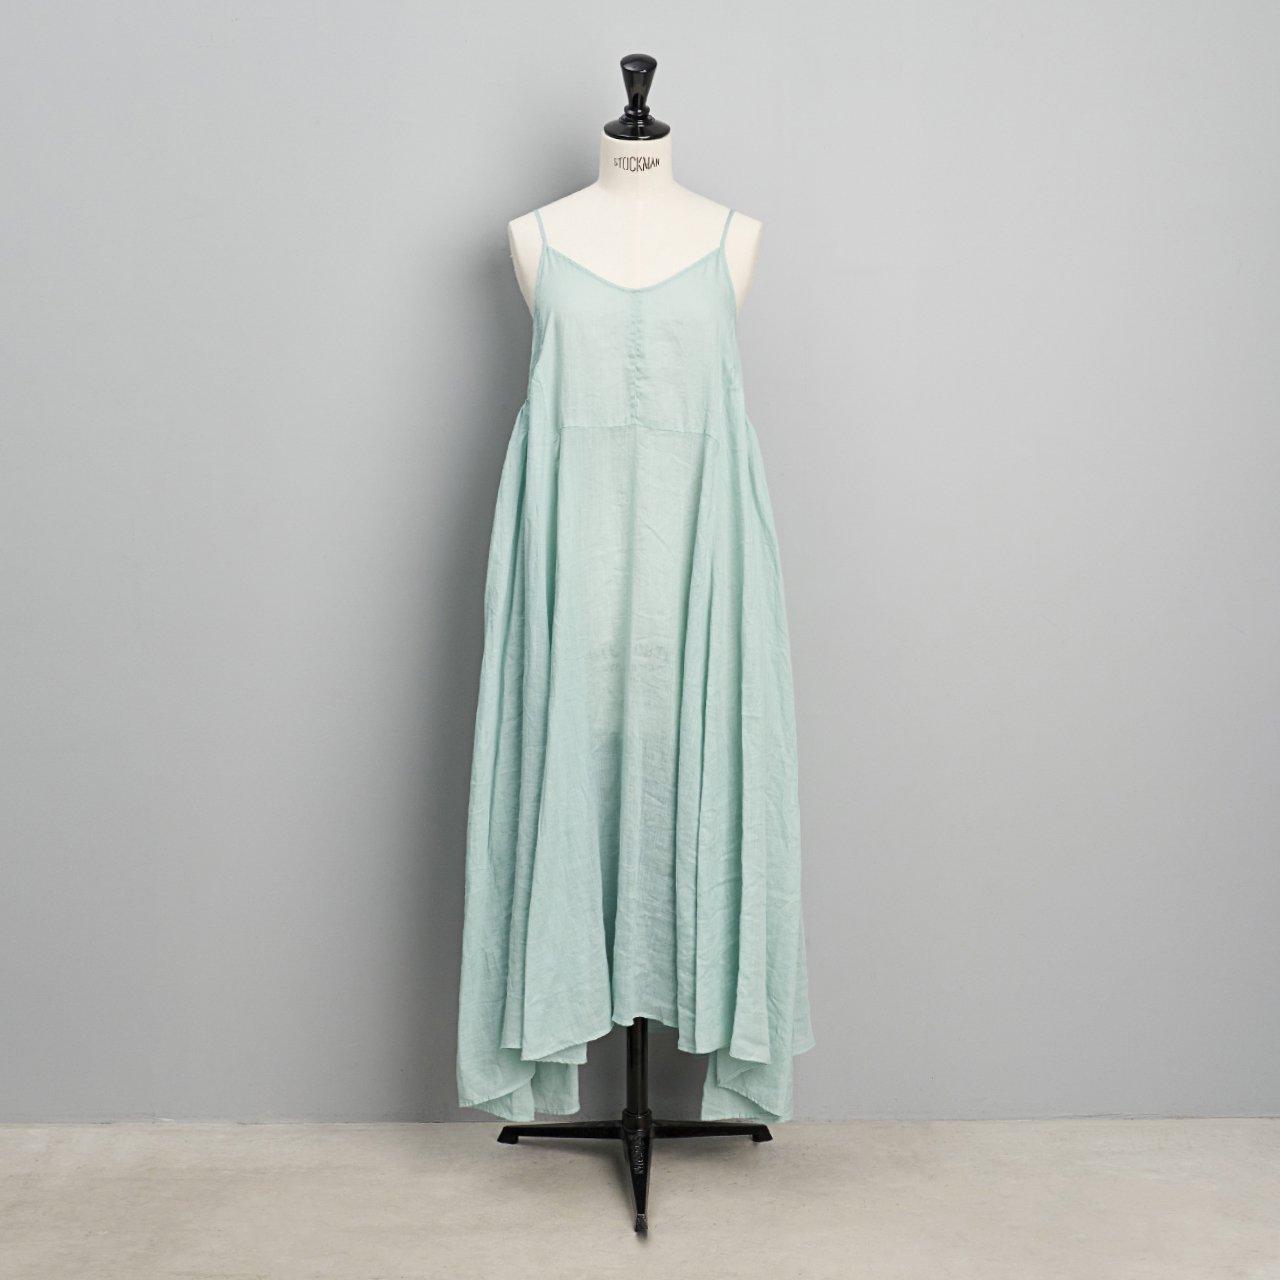 suzuki takayuki<BR>Camisole dress<BR>Spray green